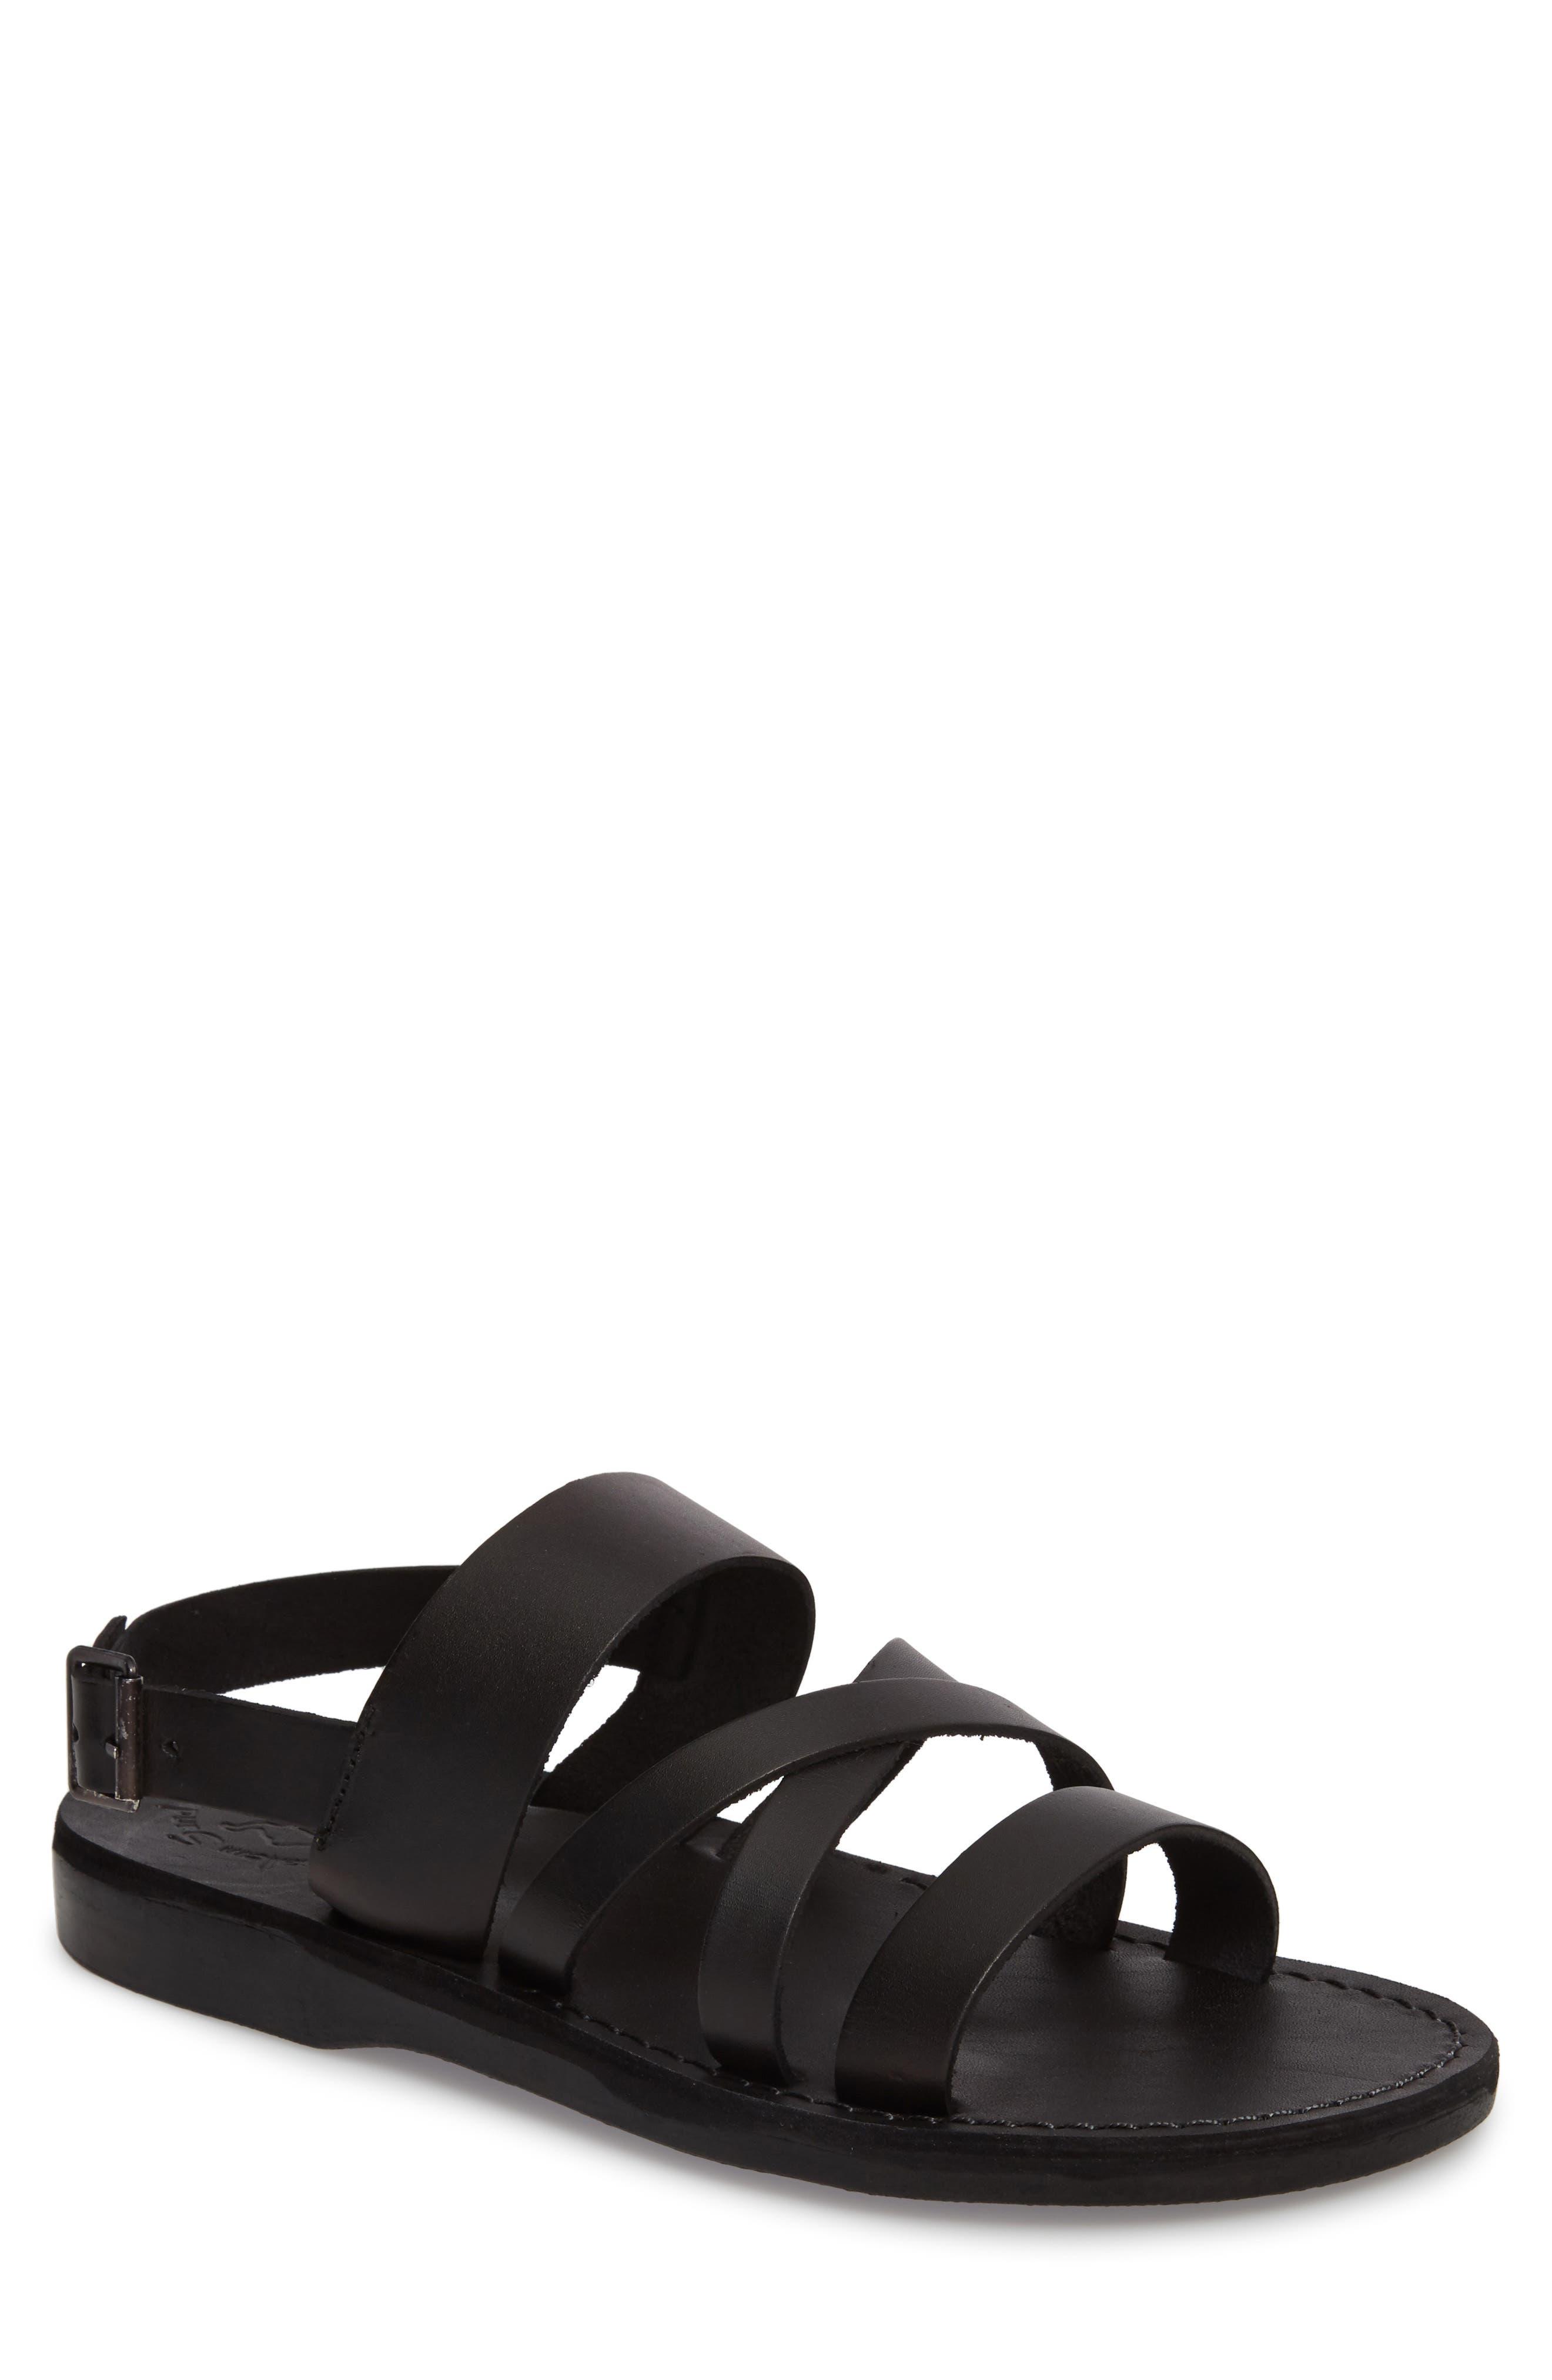 Silas Slingback Sandal,                         Main,                         color, BLACK LEATHER